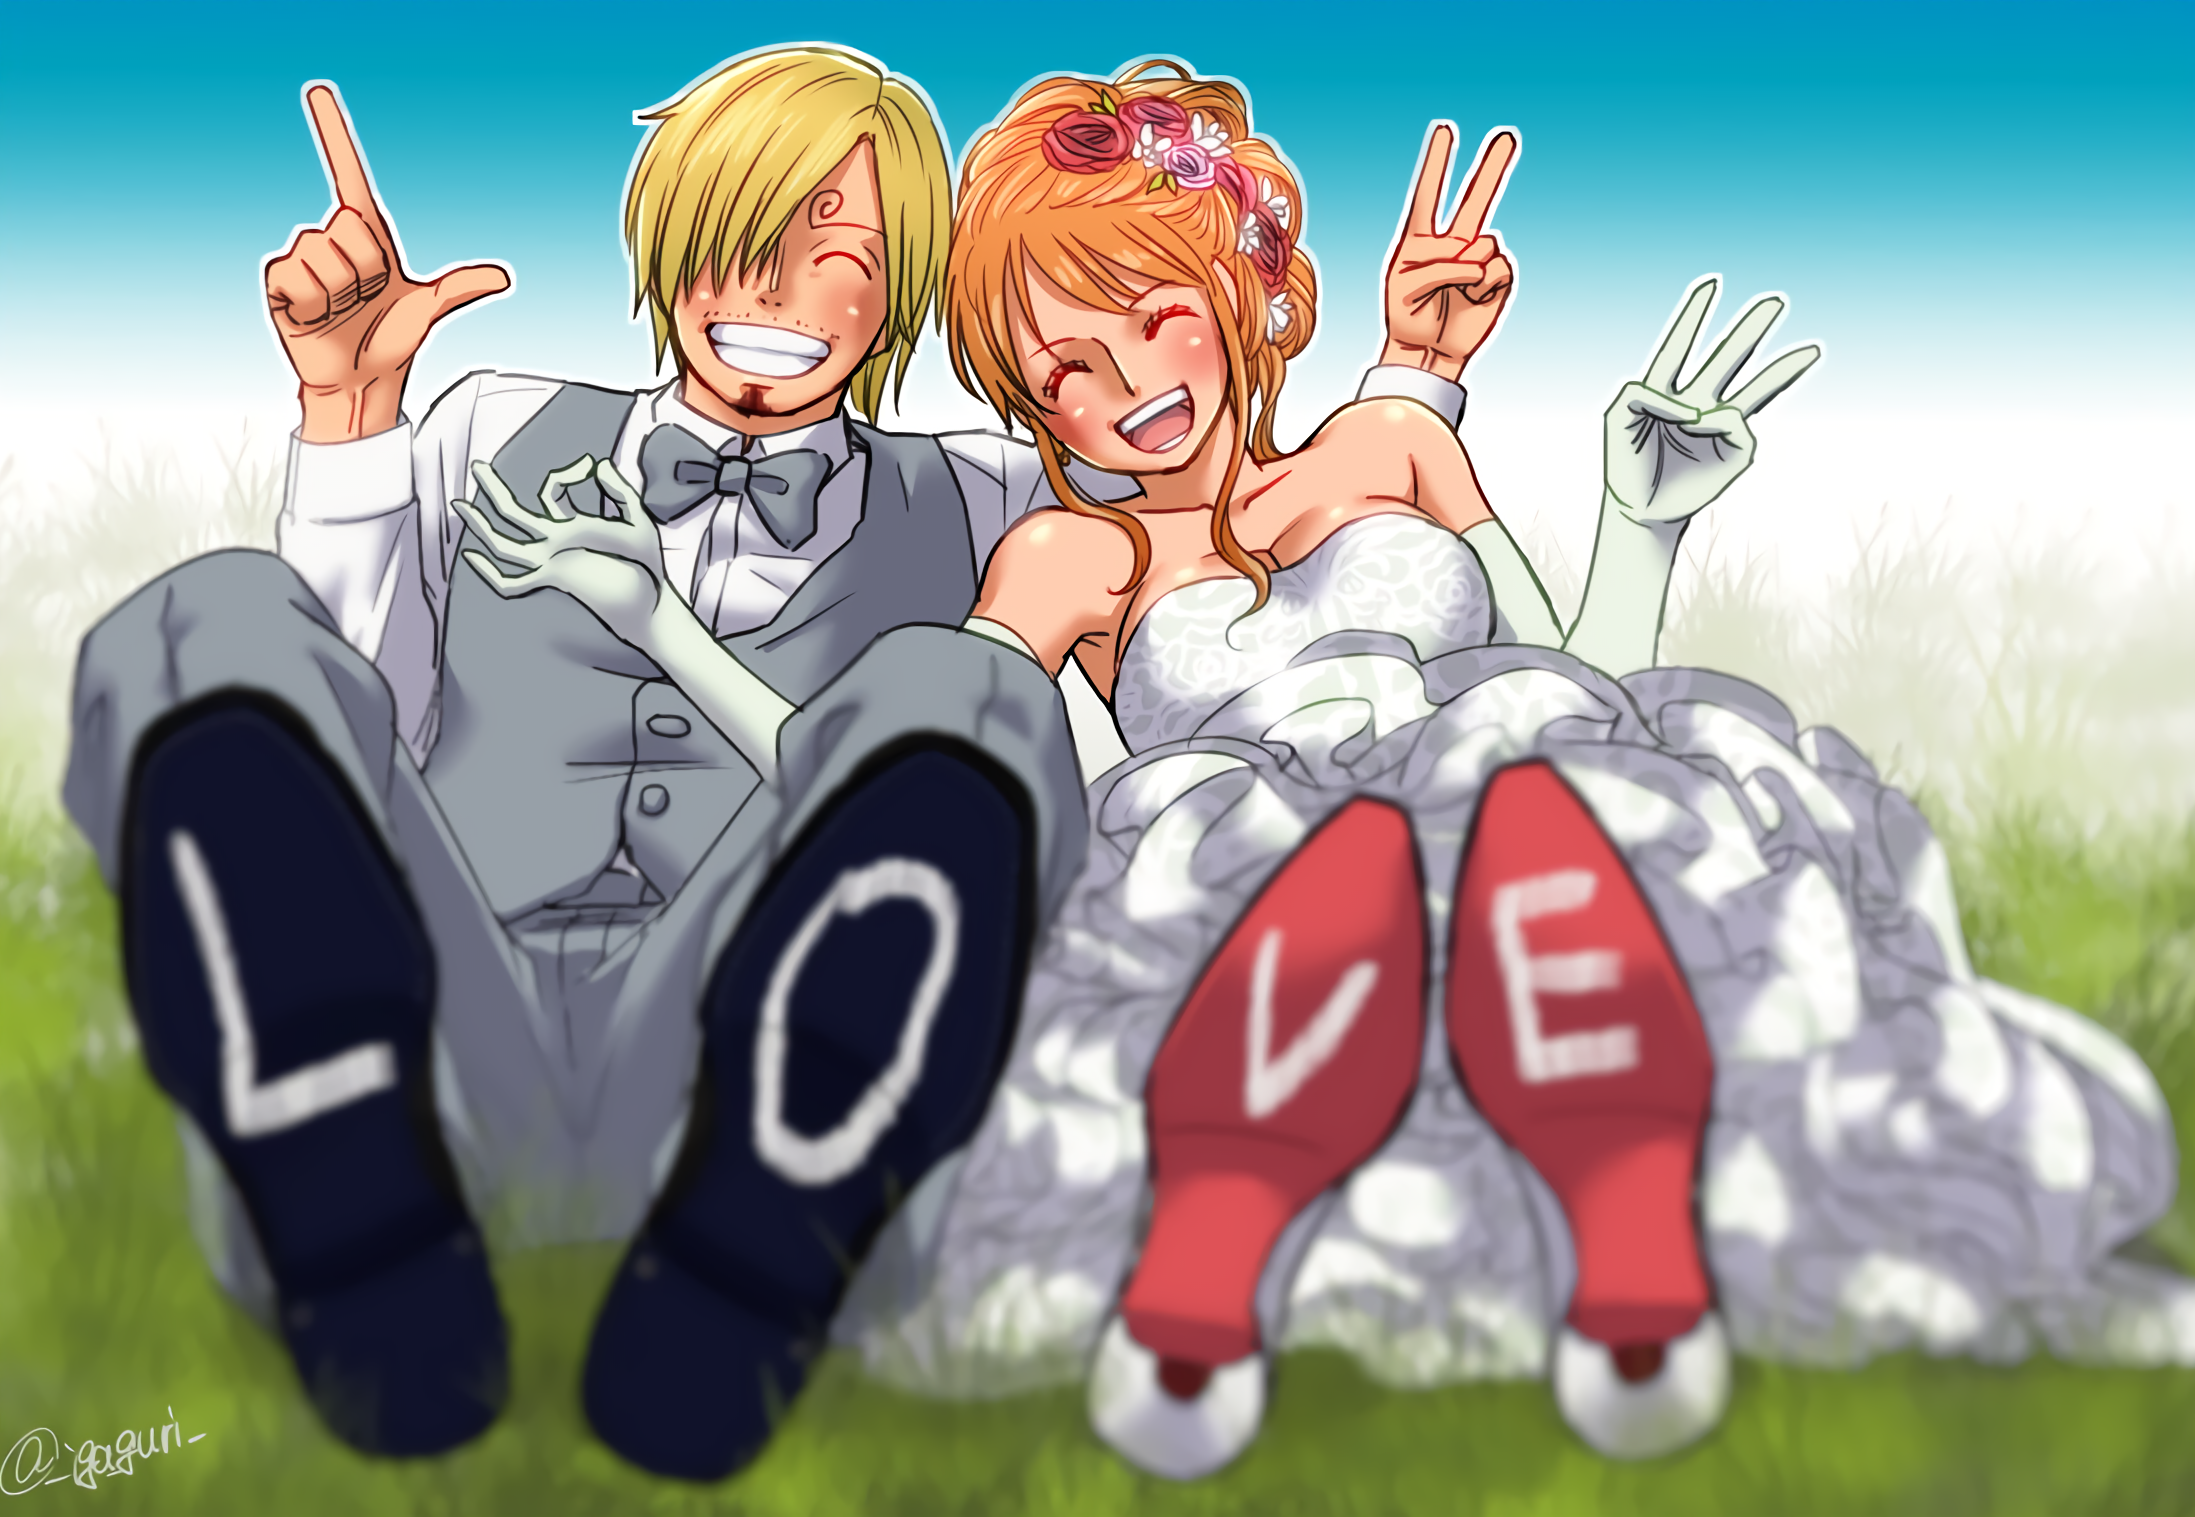 Sanji and nami